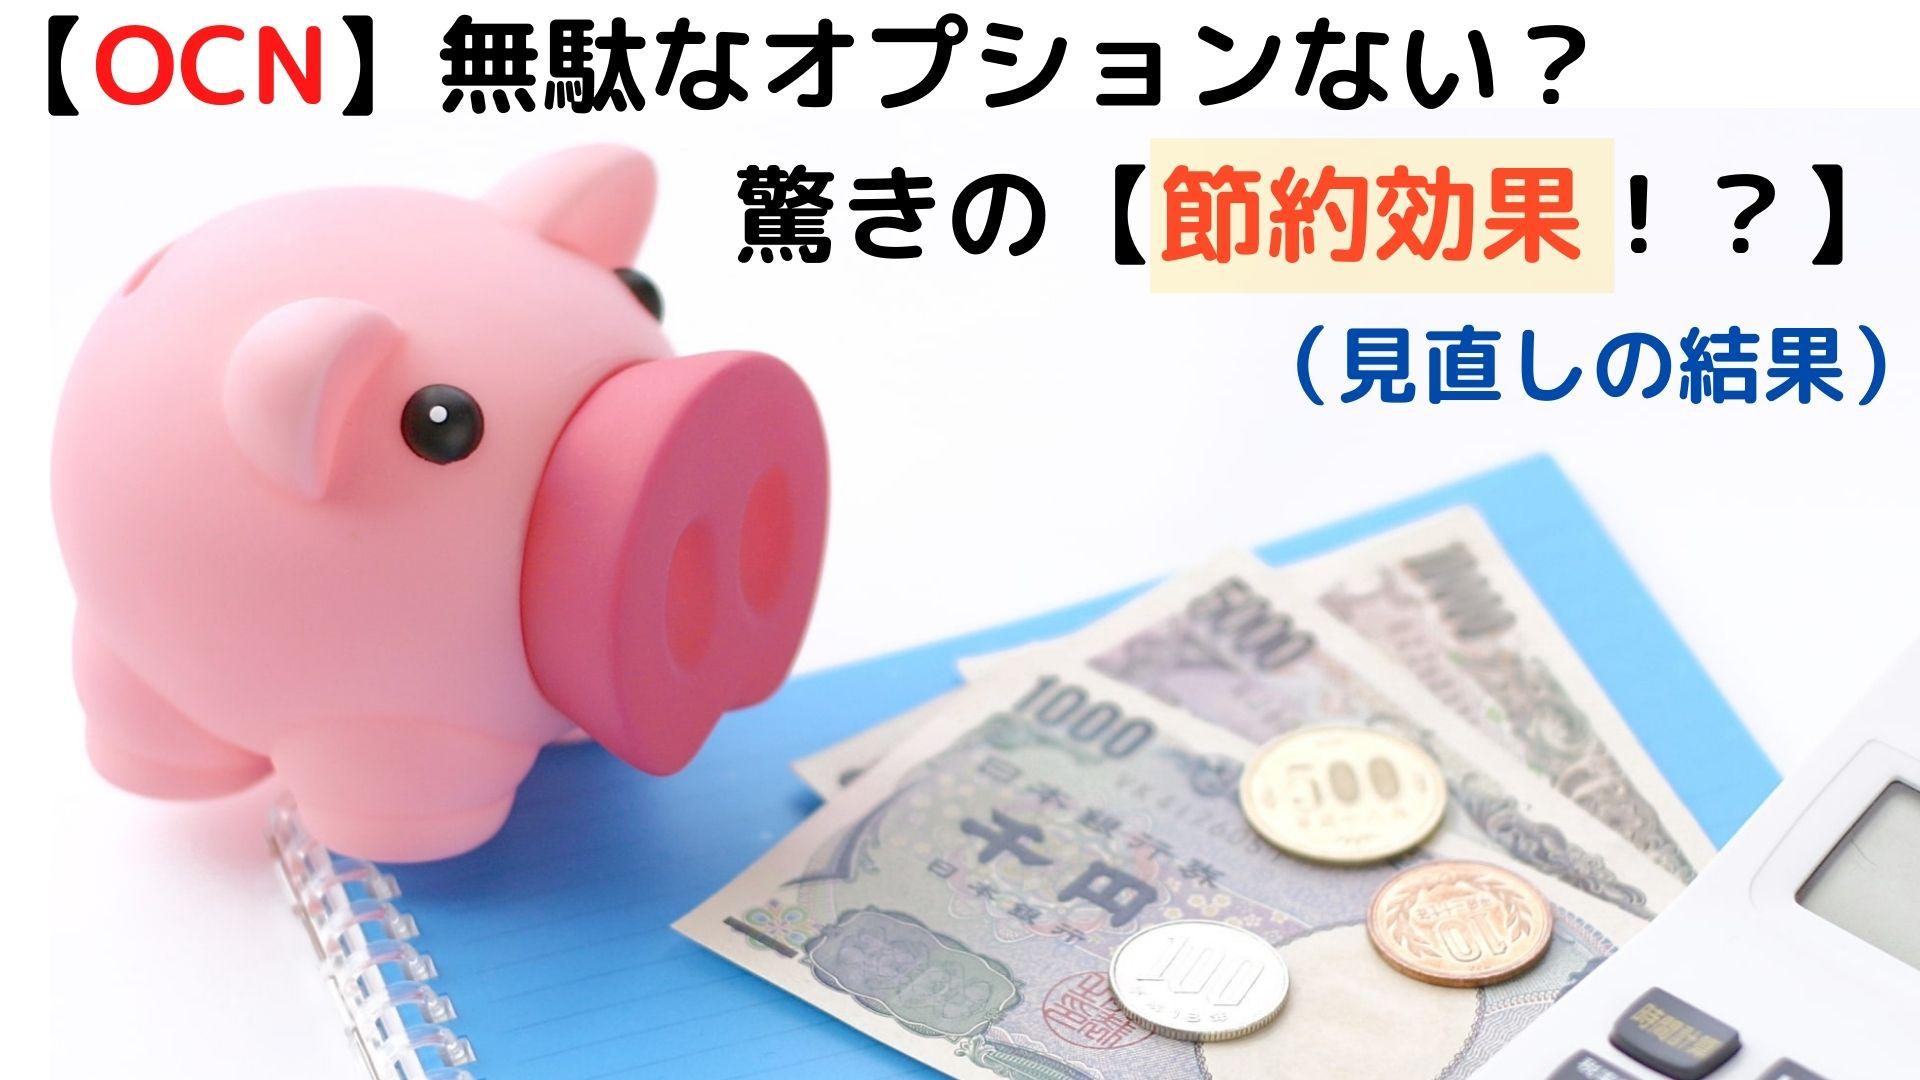 【OCN】おまかせオプションパックを解約【節約効果がすごかった!?】知らなきゃ損!